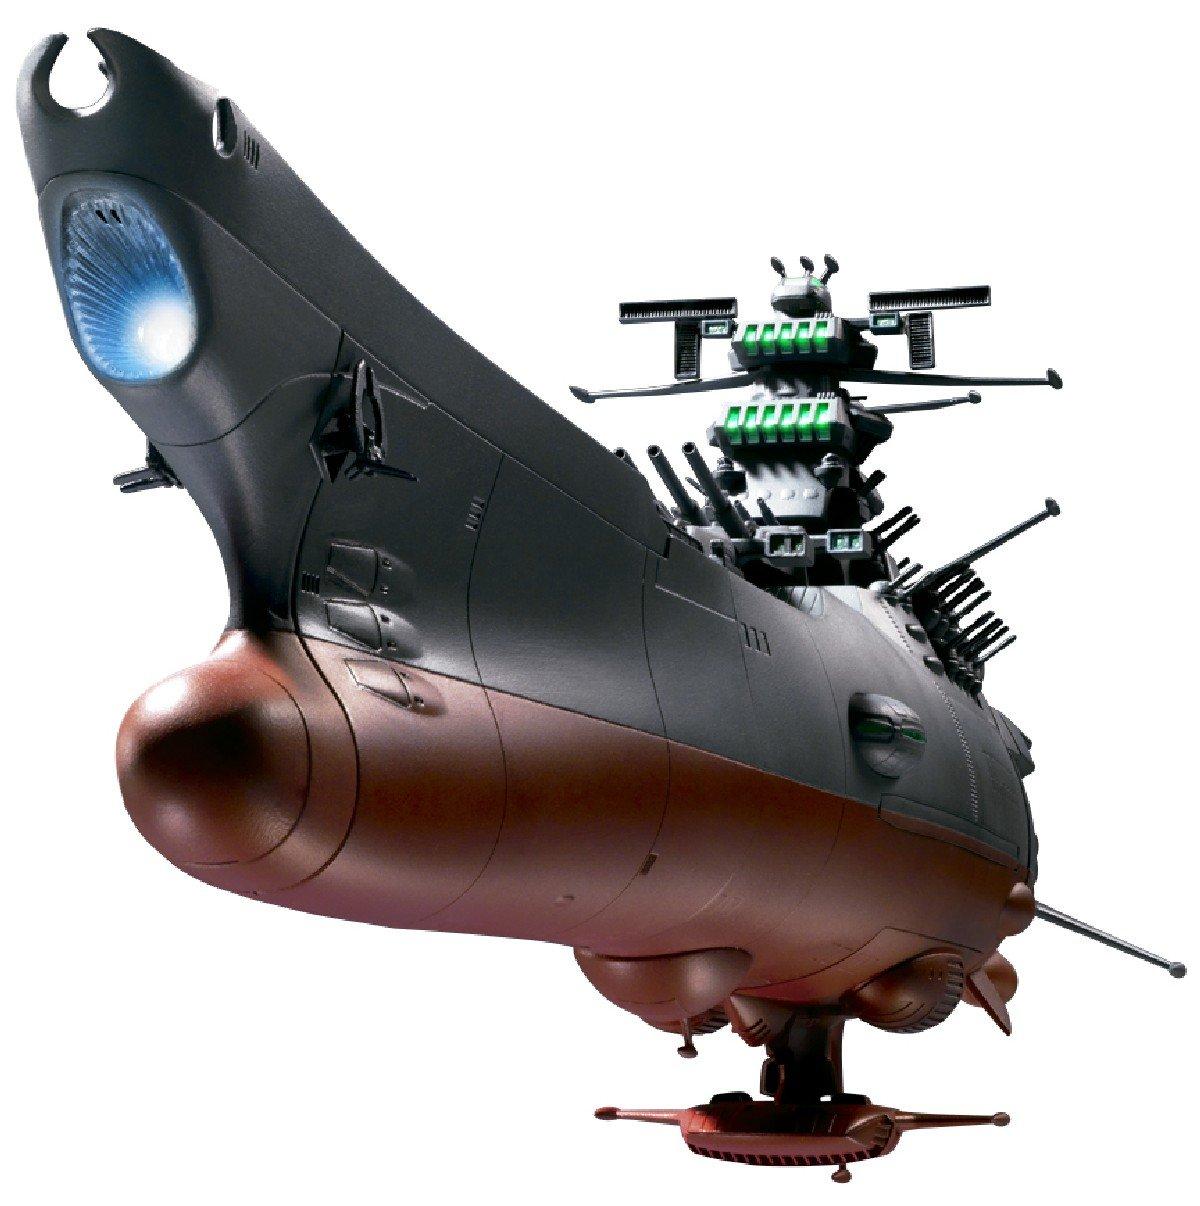 Yamato Space Soc GX-64 Space Yamato Battle Ship 2199 Figur fd2b0c